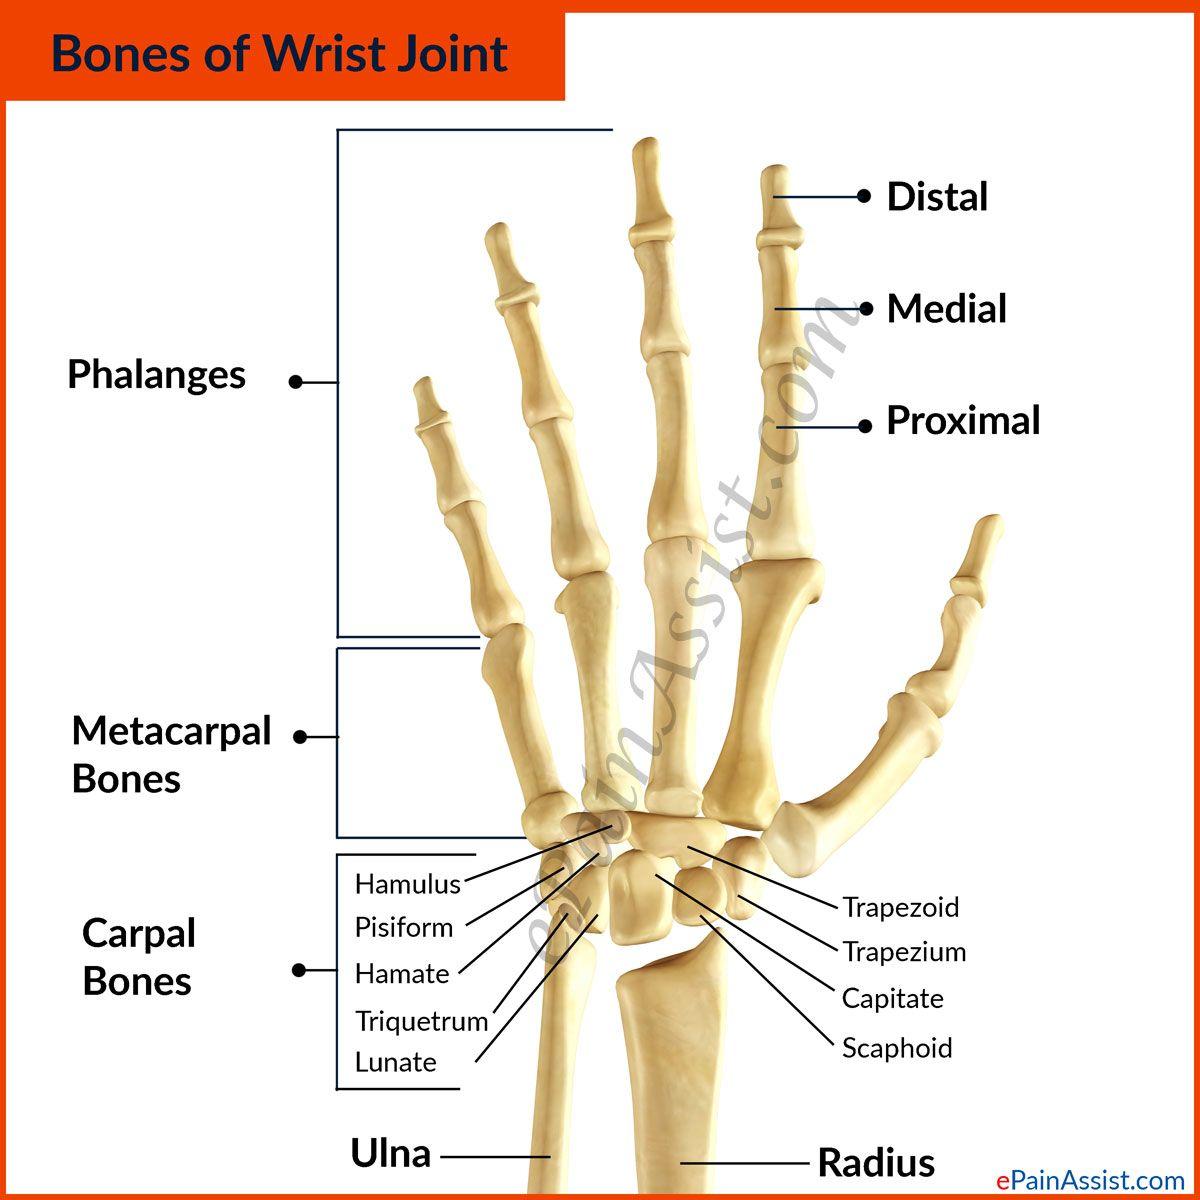 Wrist Joint Anatomy | Ouch...Wrist Pain! | Pinterest | Wrist pain ...